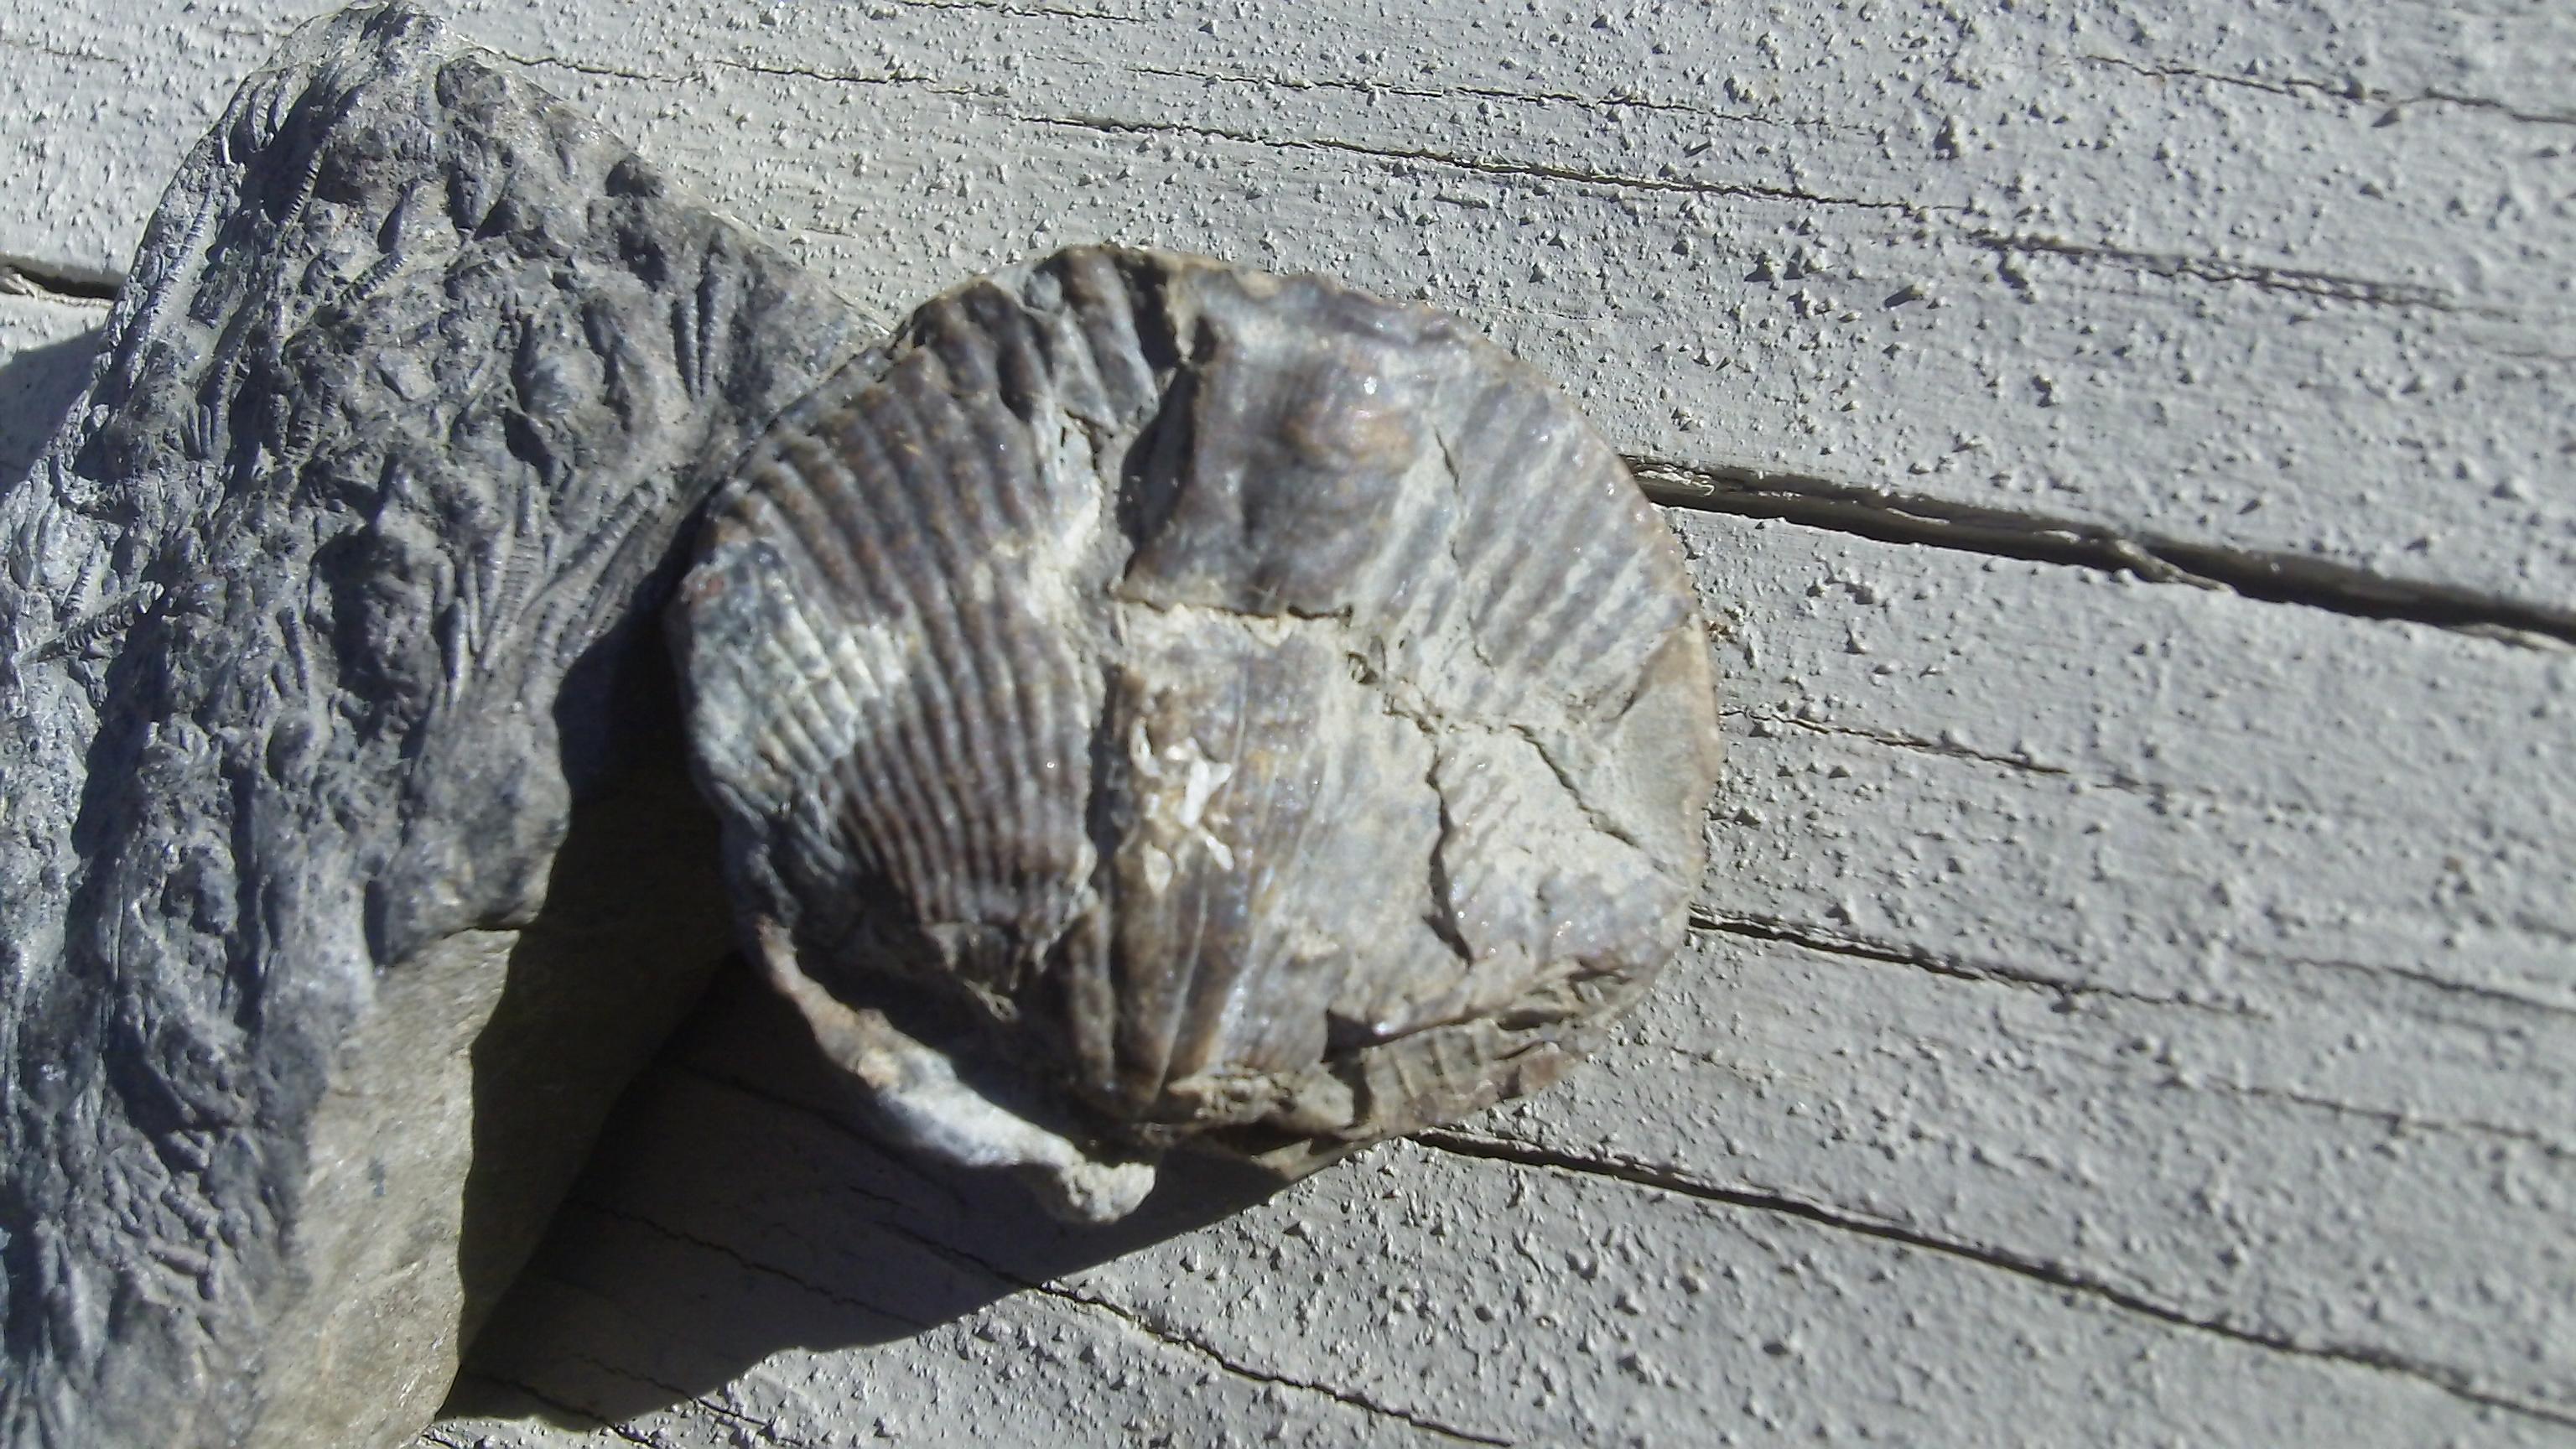 Crinoid-Brachiopod